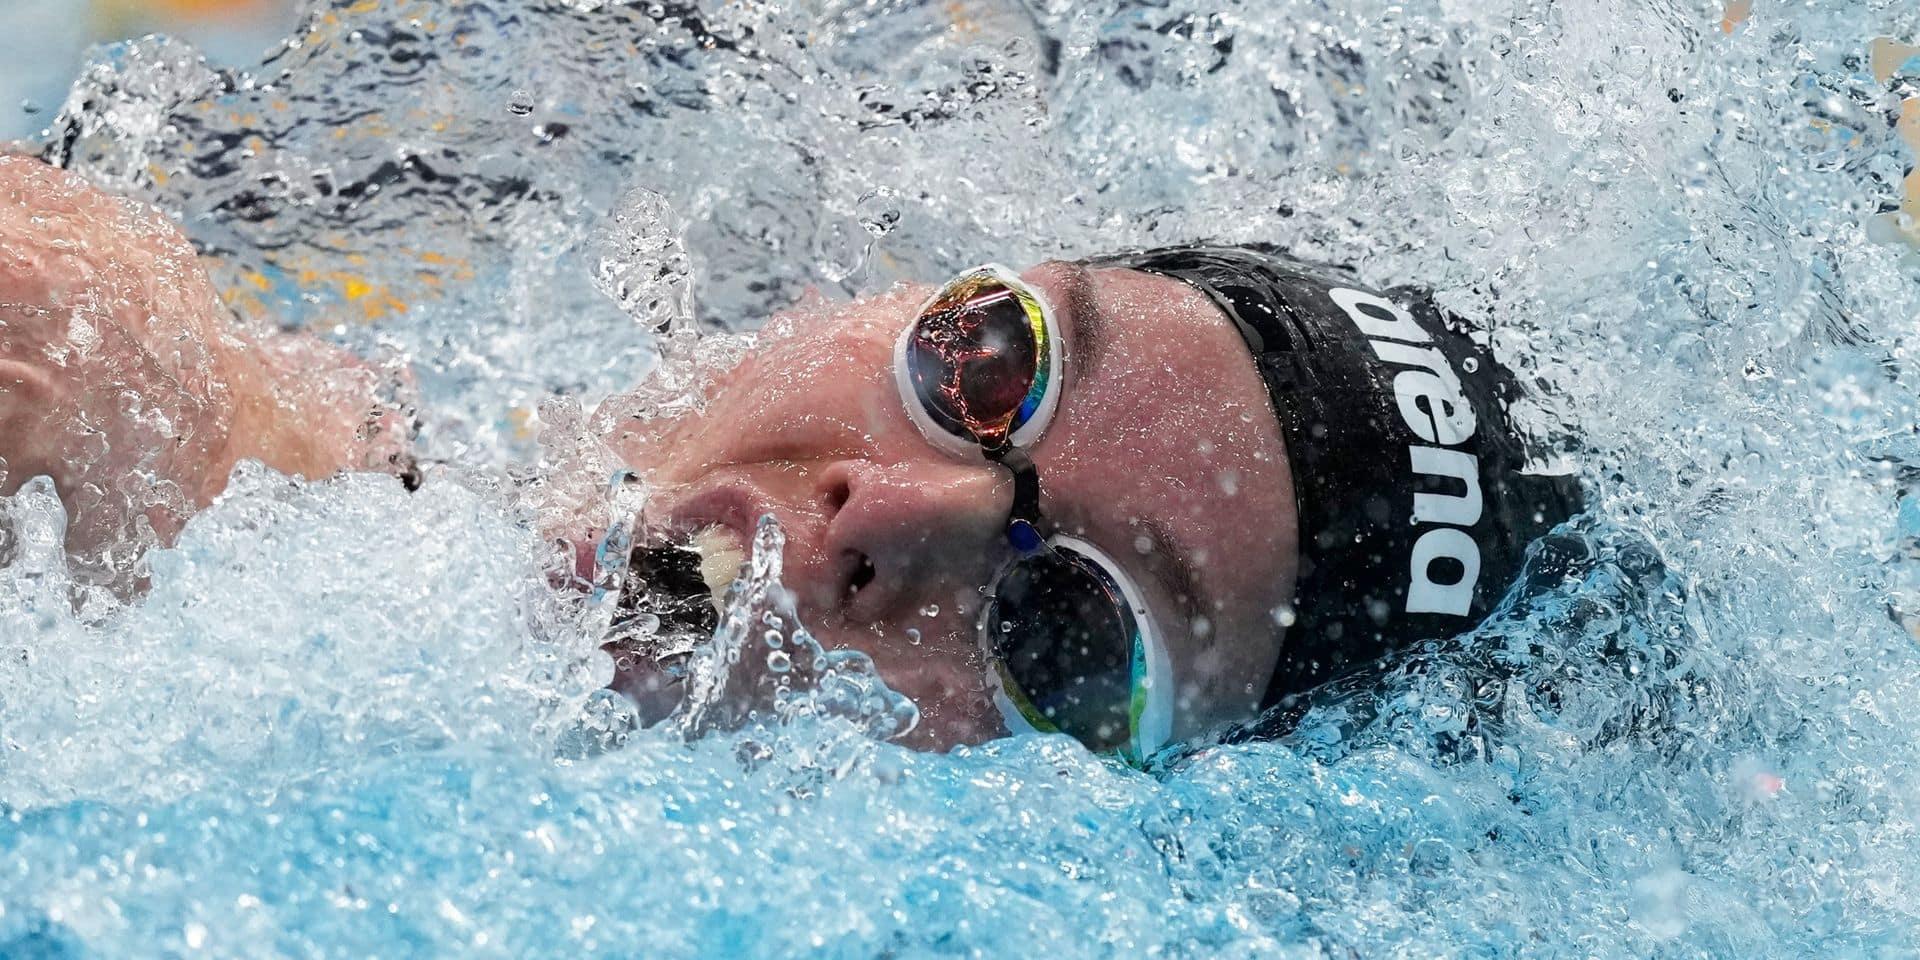 La championne d'Europe du 100 m libre Femke Heemskerk va prendre sa retraite